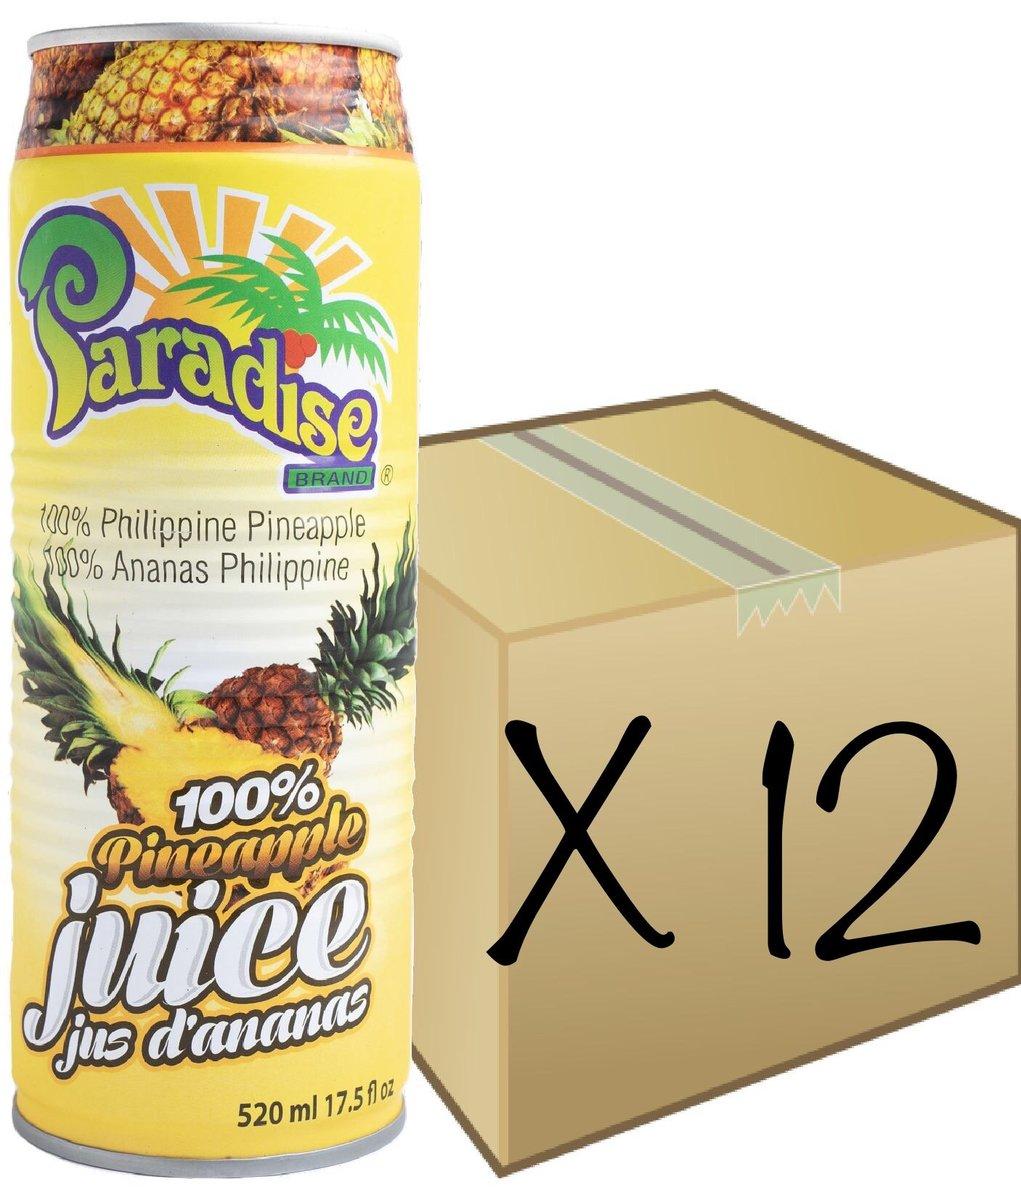 [FULL CASE] 100% Pineapple Juice